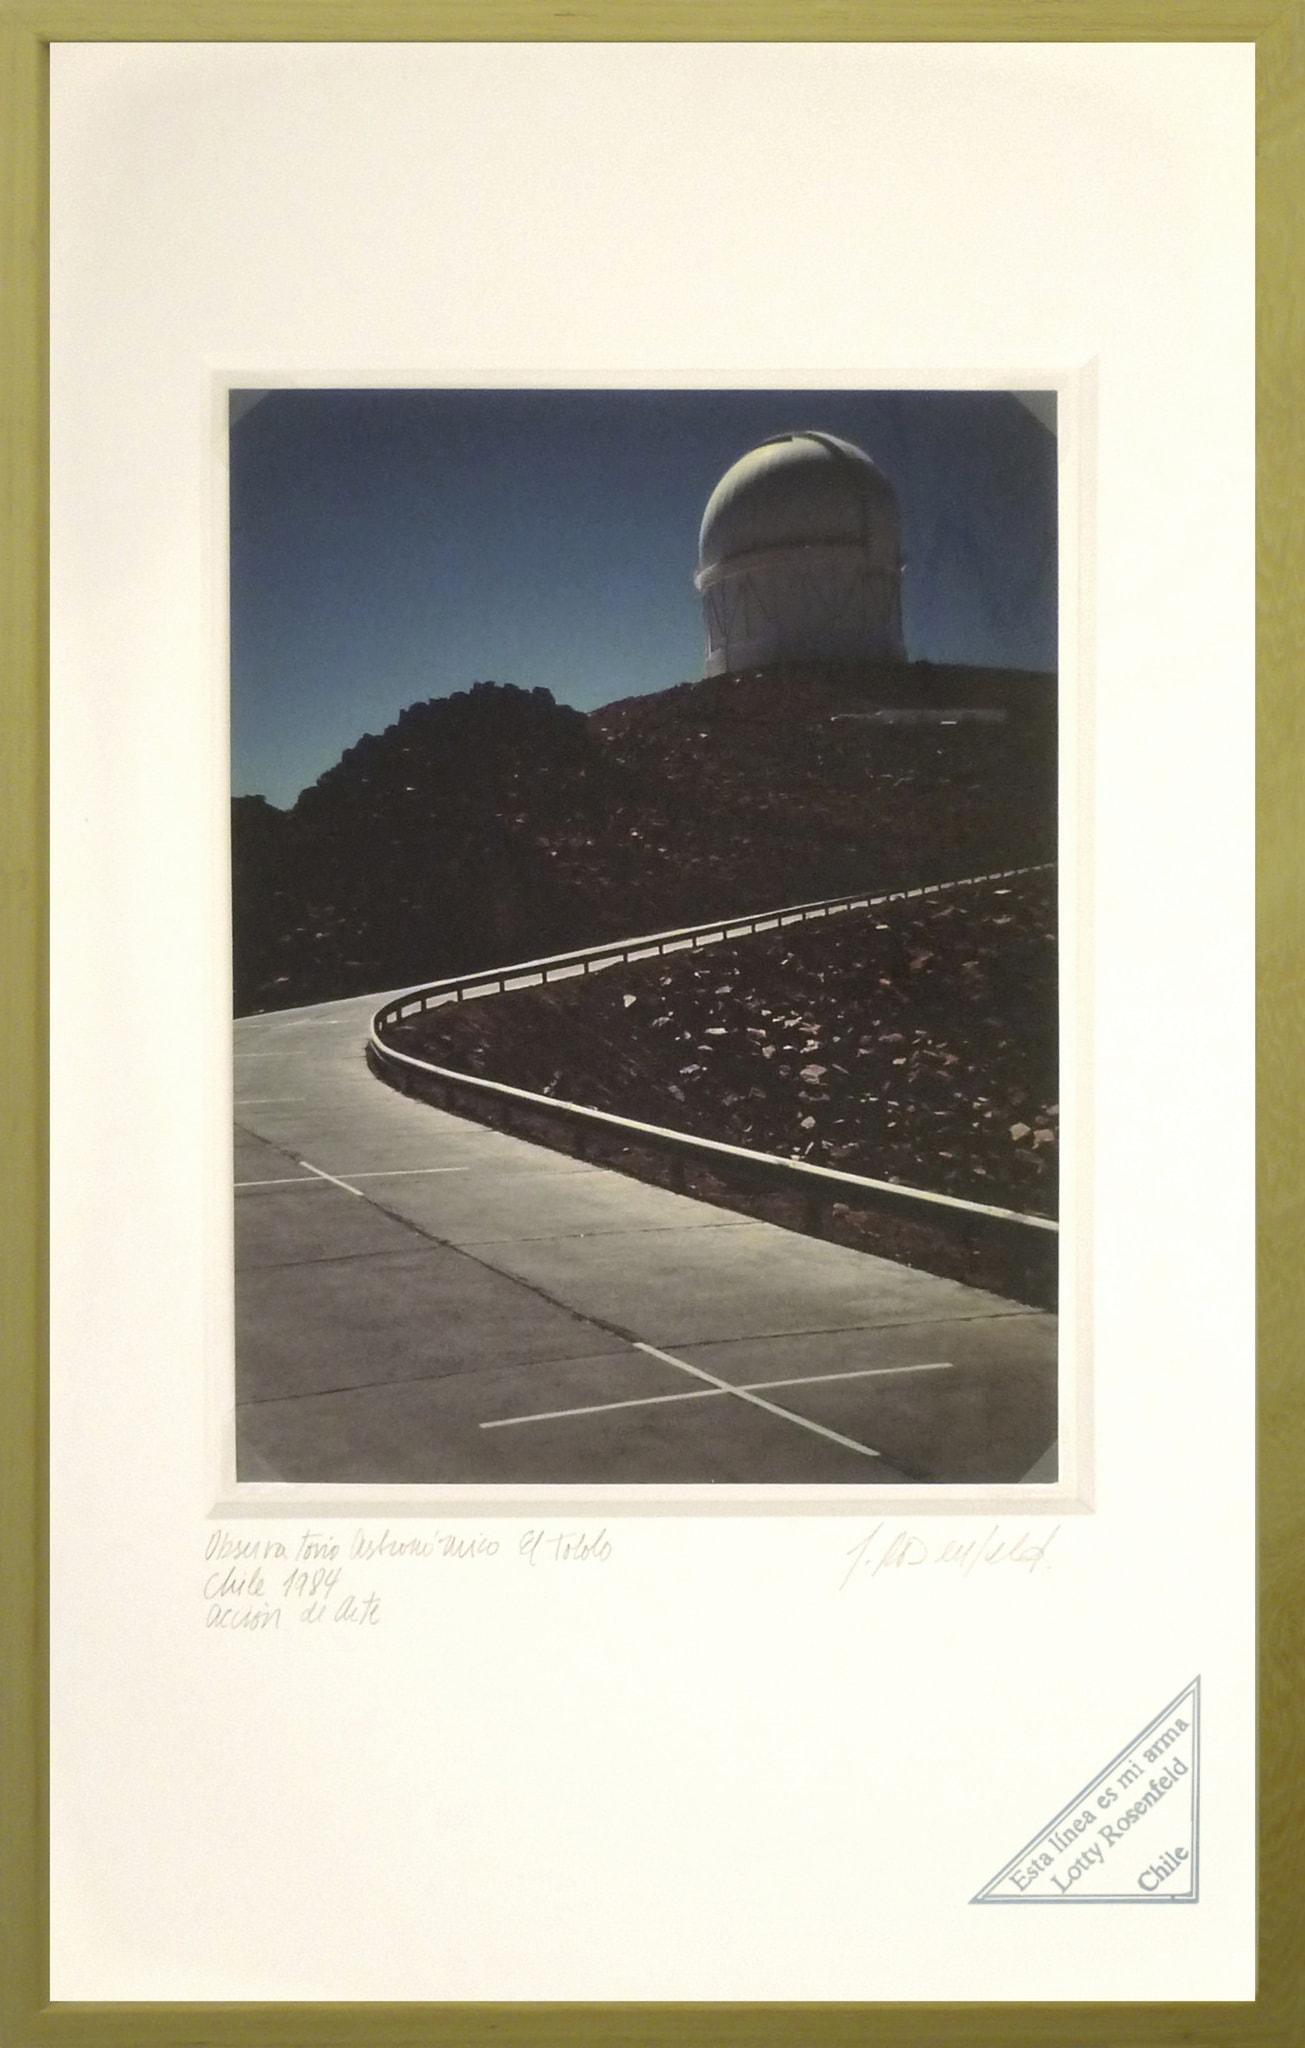 El Tololo. Observatorio Astronómico / El Tololo. Astronomical Observatory by Lotty Rosenfeld